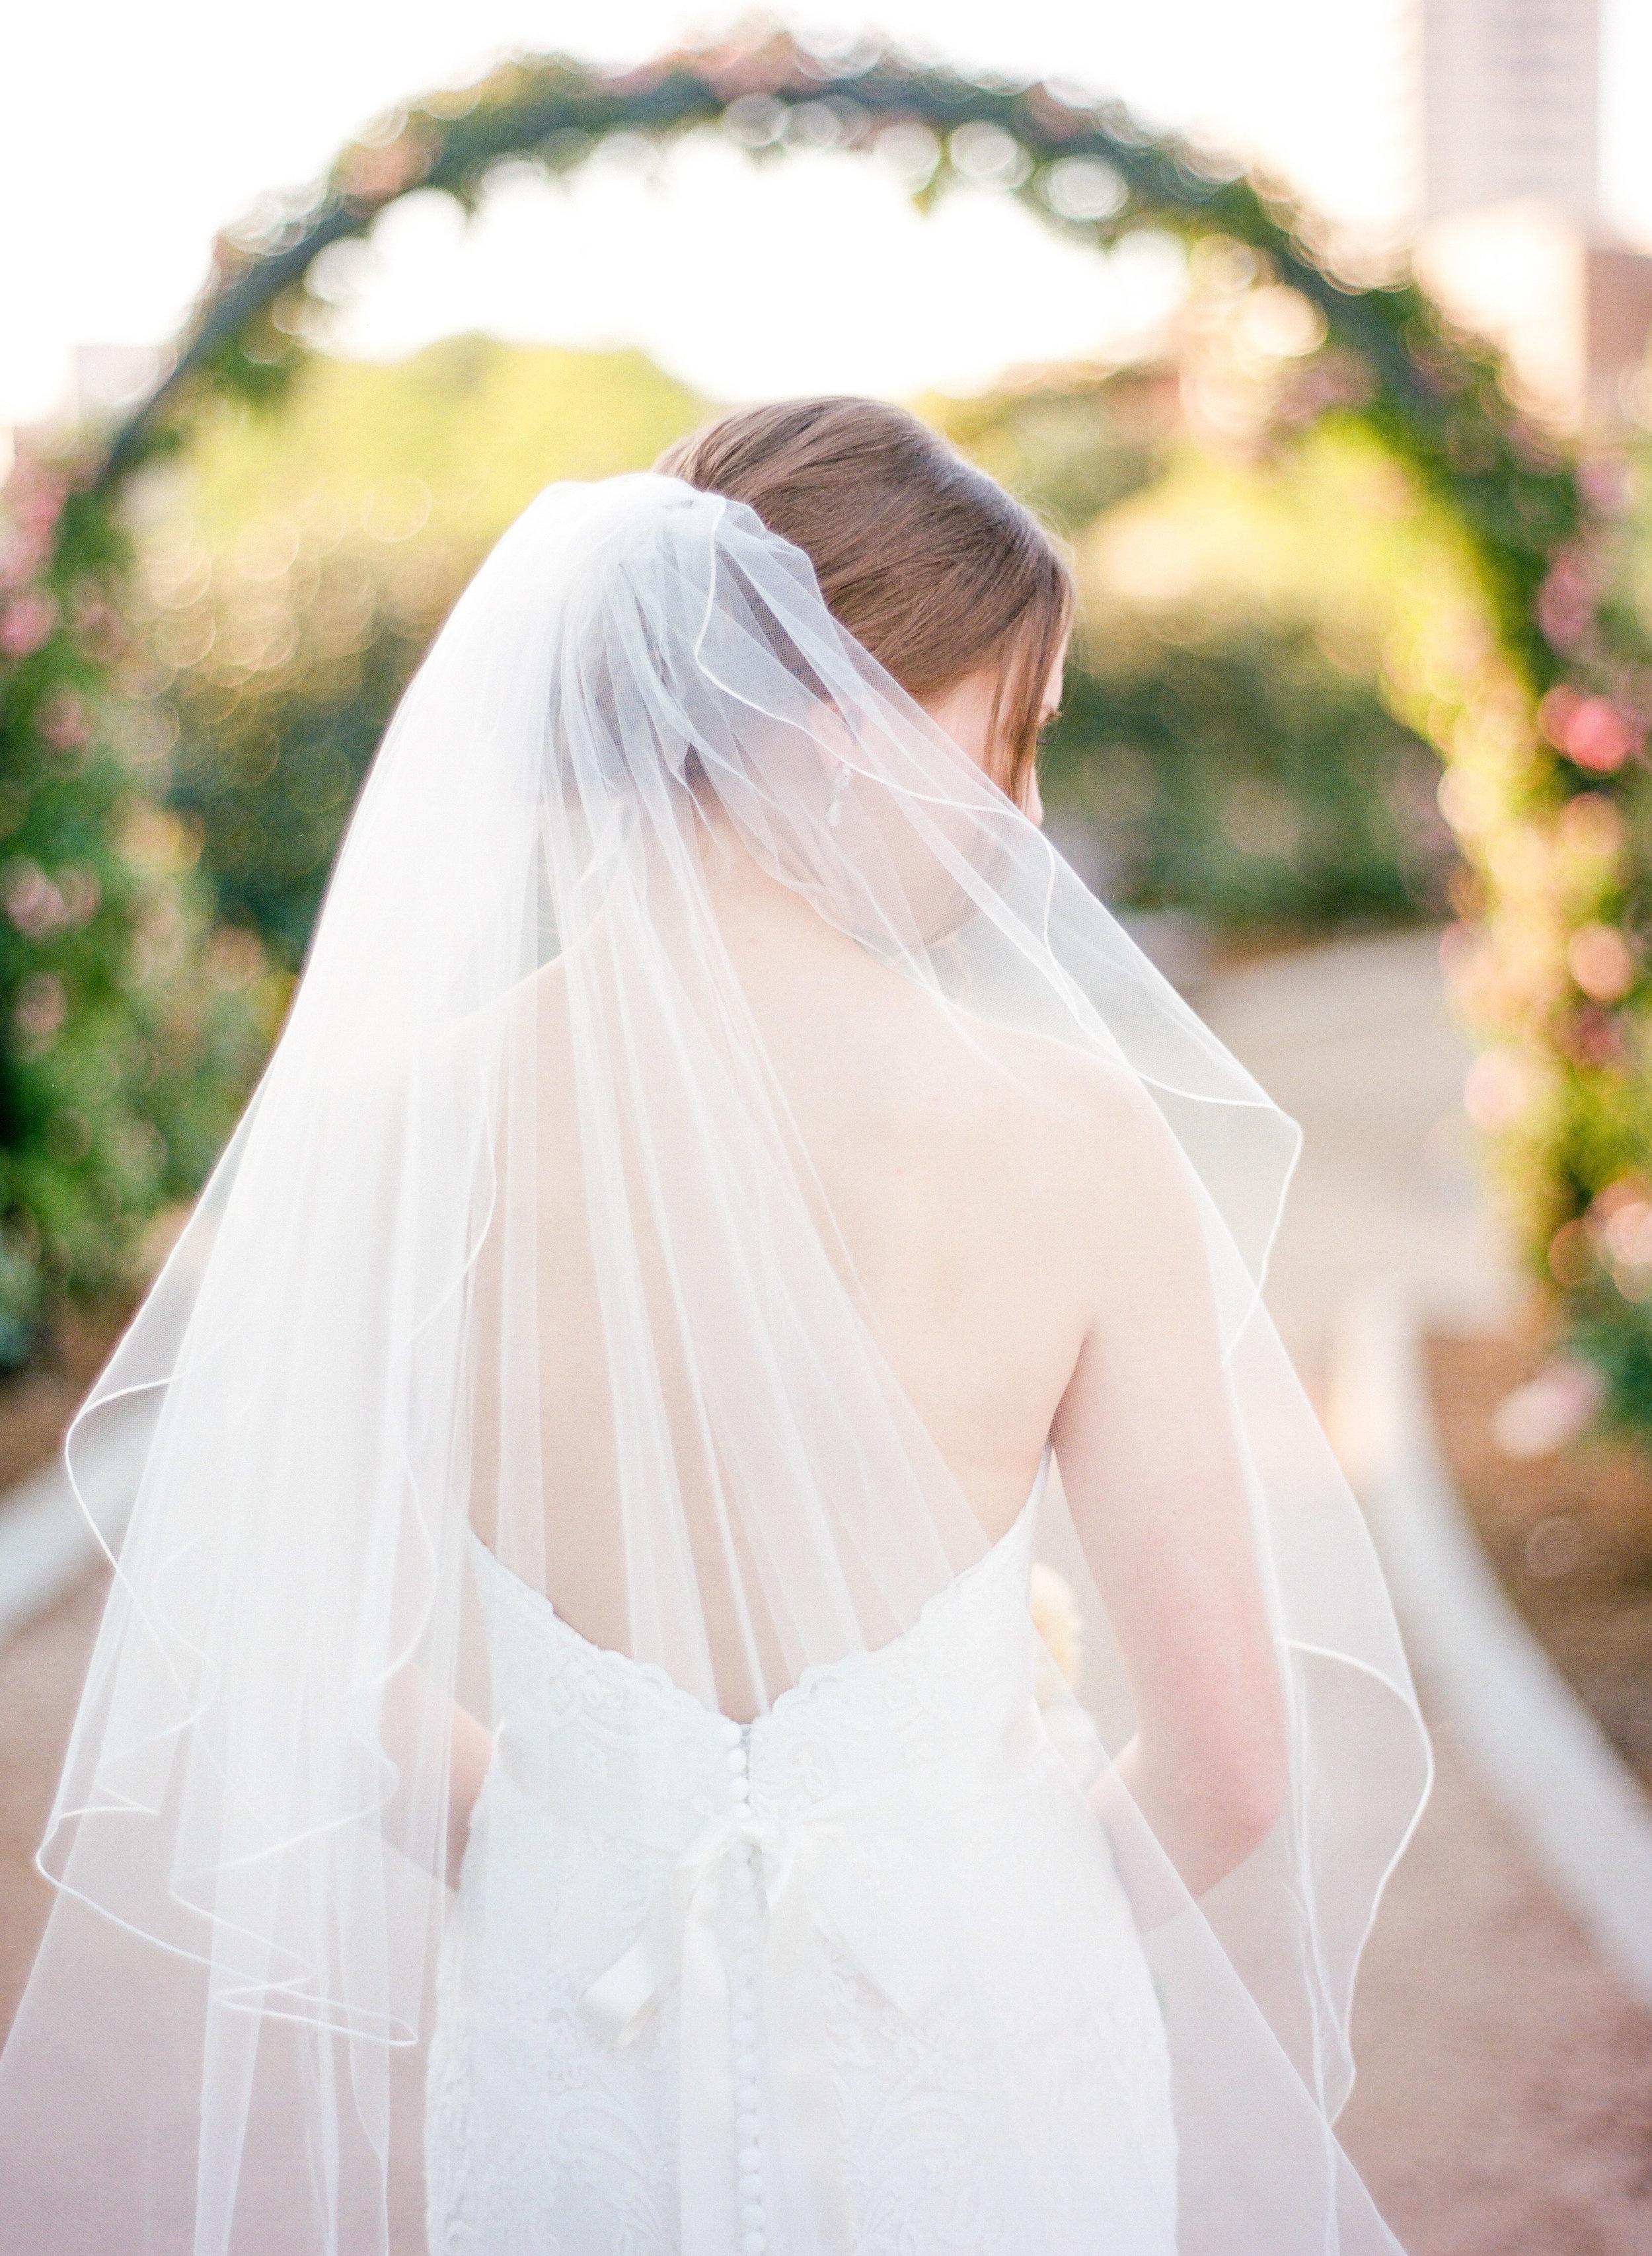 Houston-Wedding-Photographer-Film-Fine-Art-Bridals-Dana+Fernandez-Photography-14.jpg